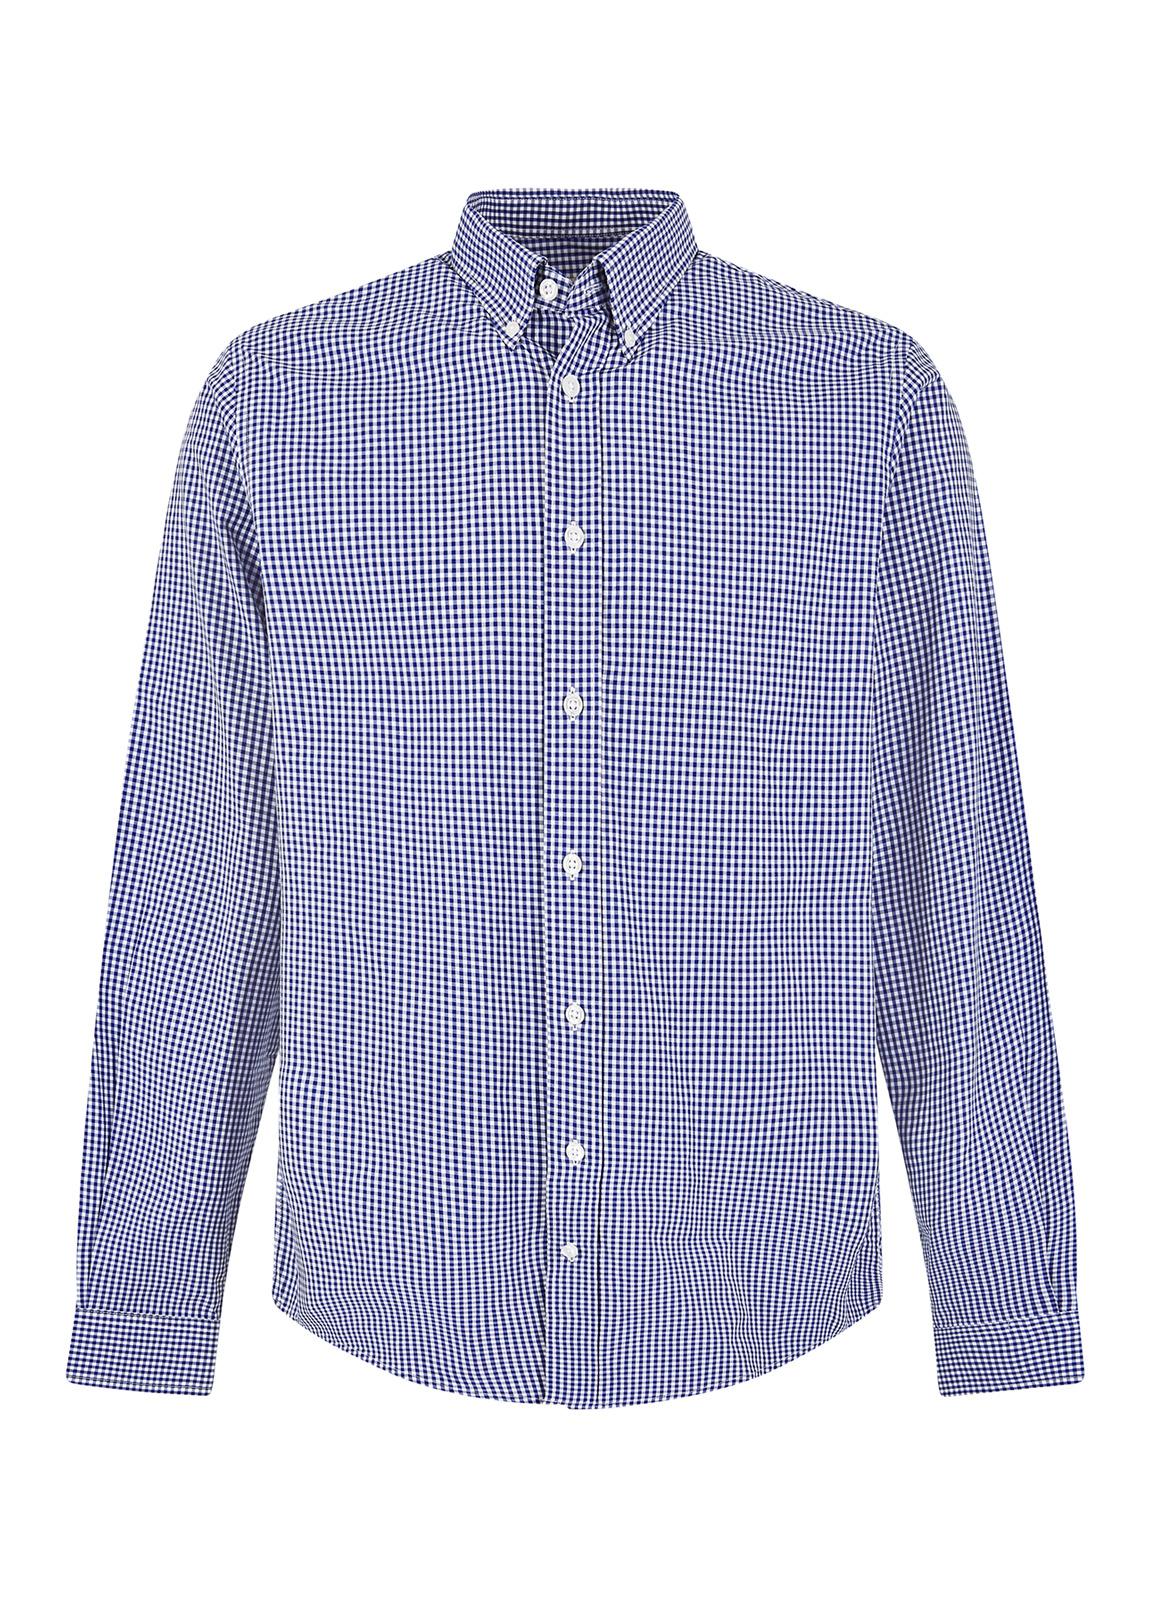 Longwood Shirt - Navy